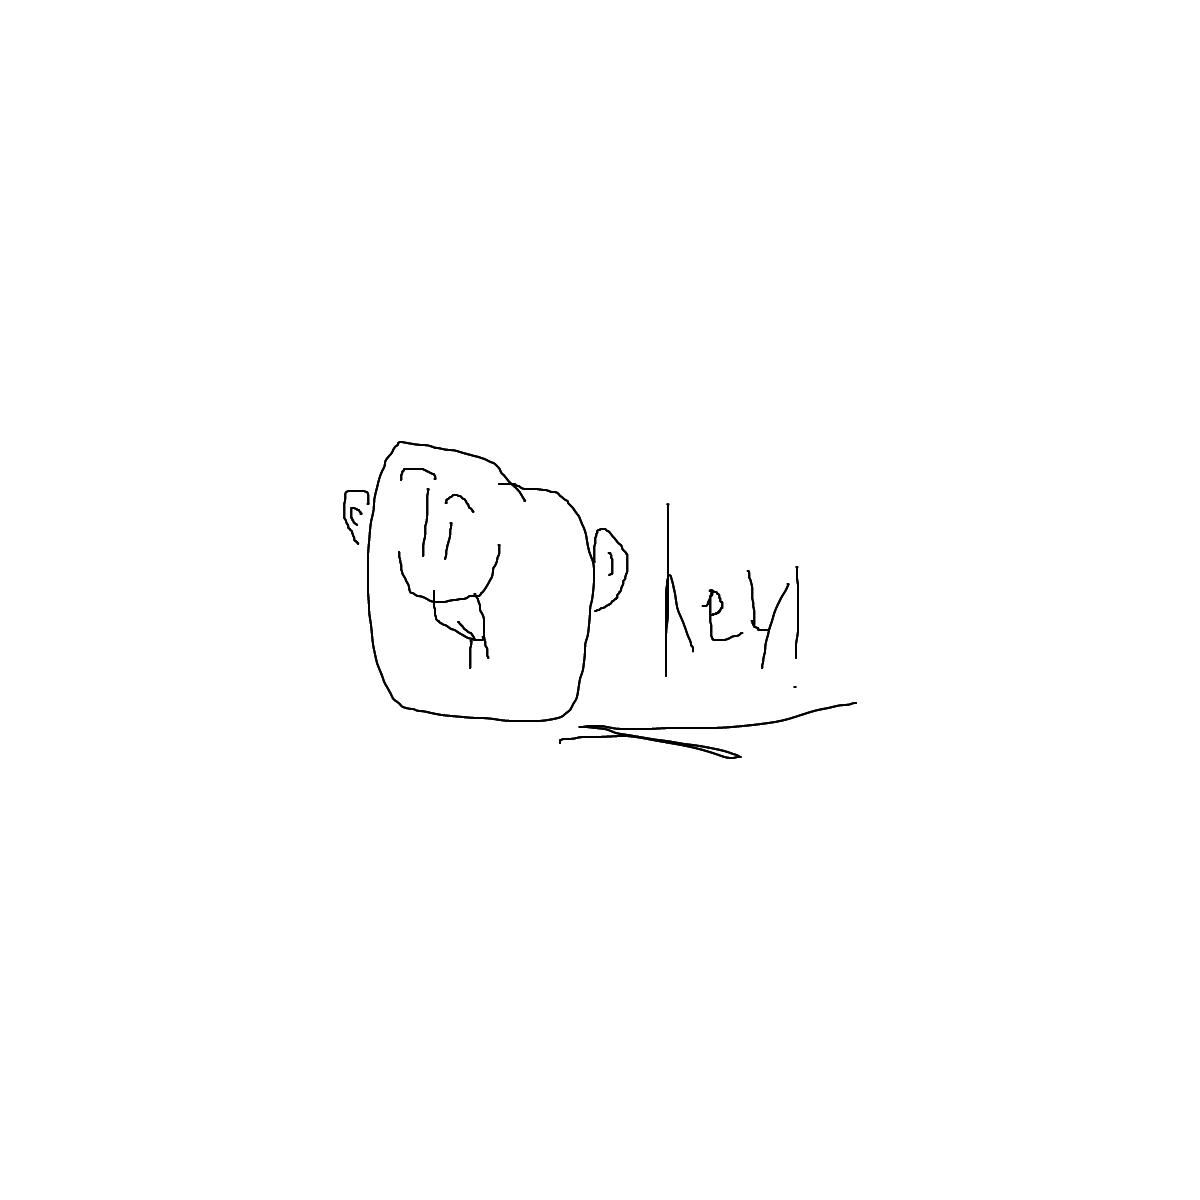 BAAAM drawing#4141 lat:33.4876174926757800lng: -112.7089767456054700